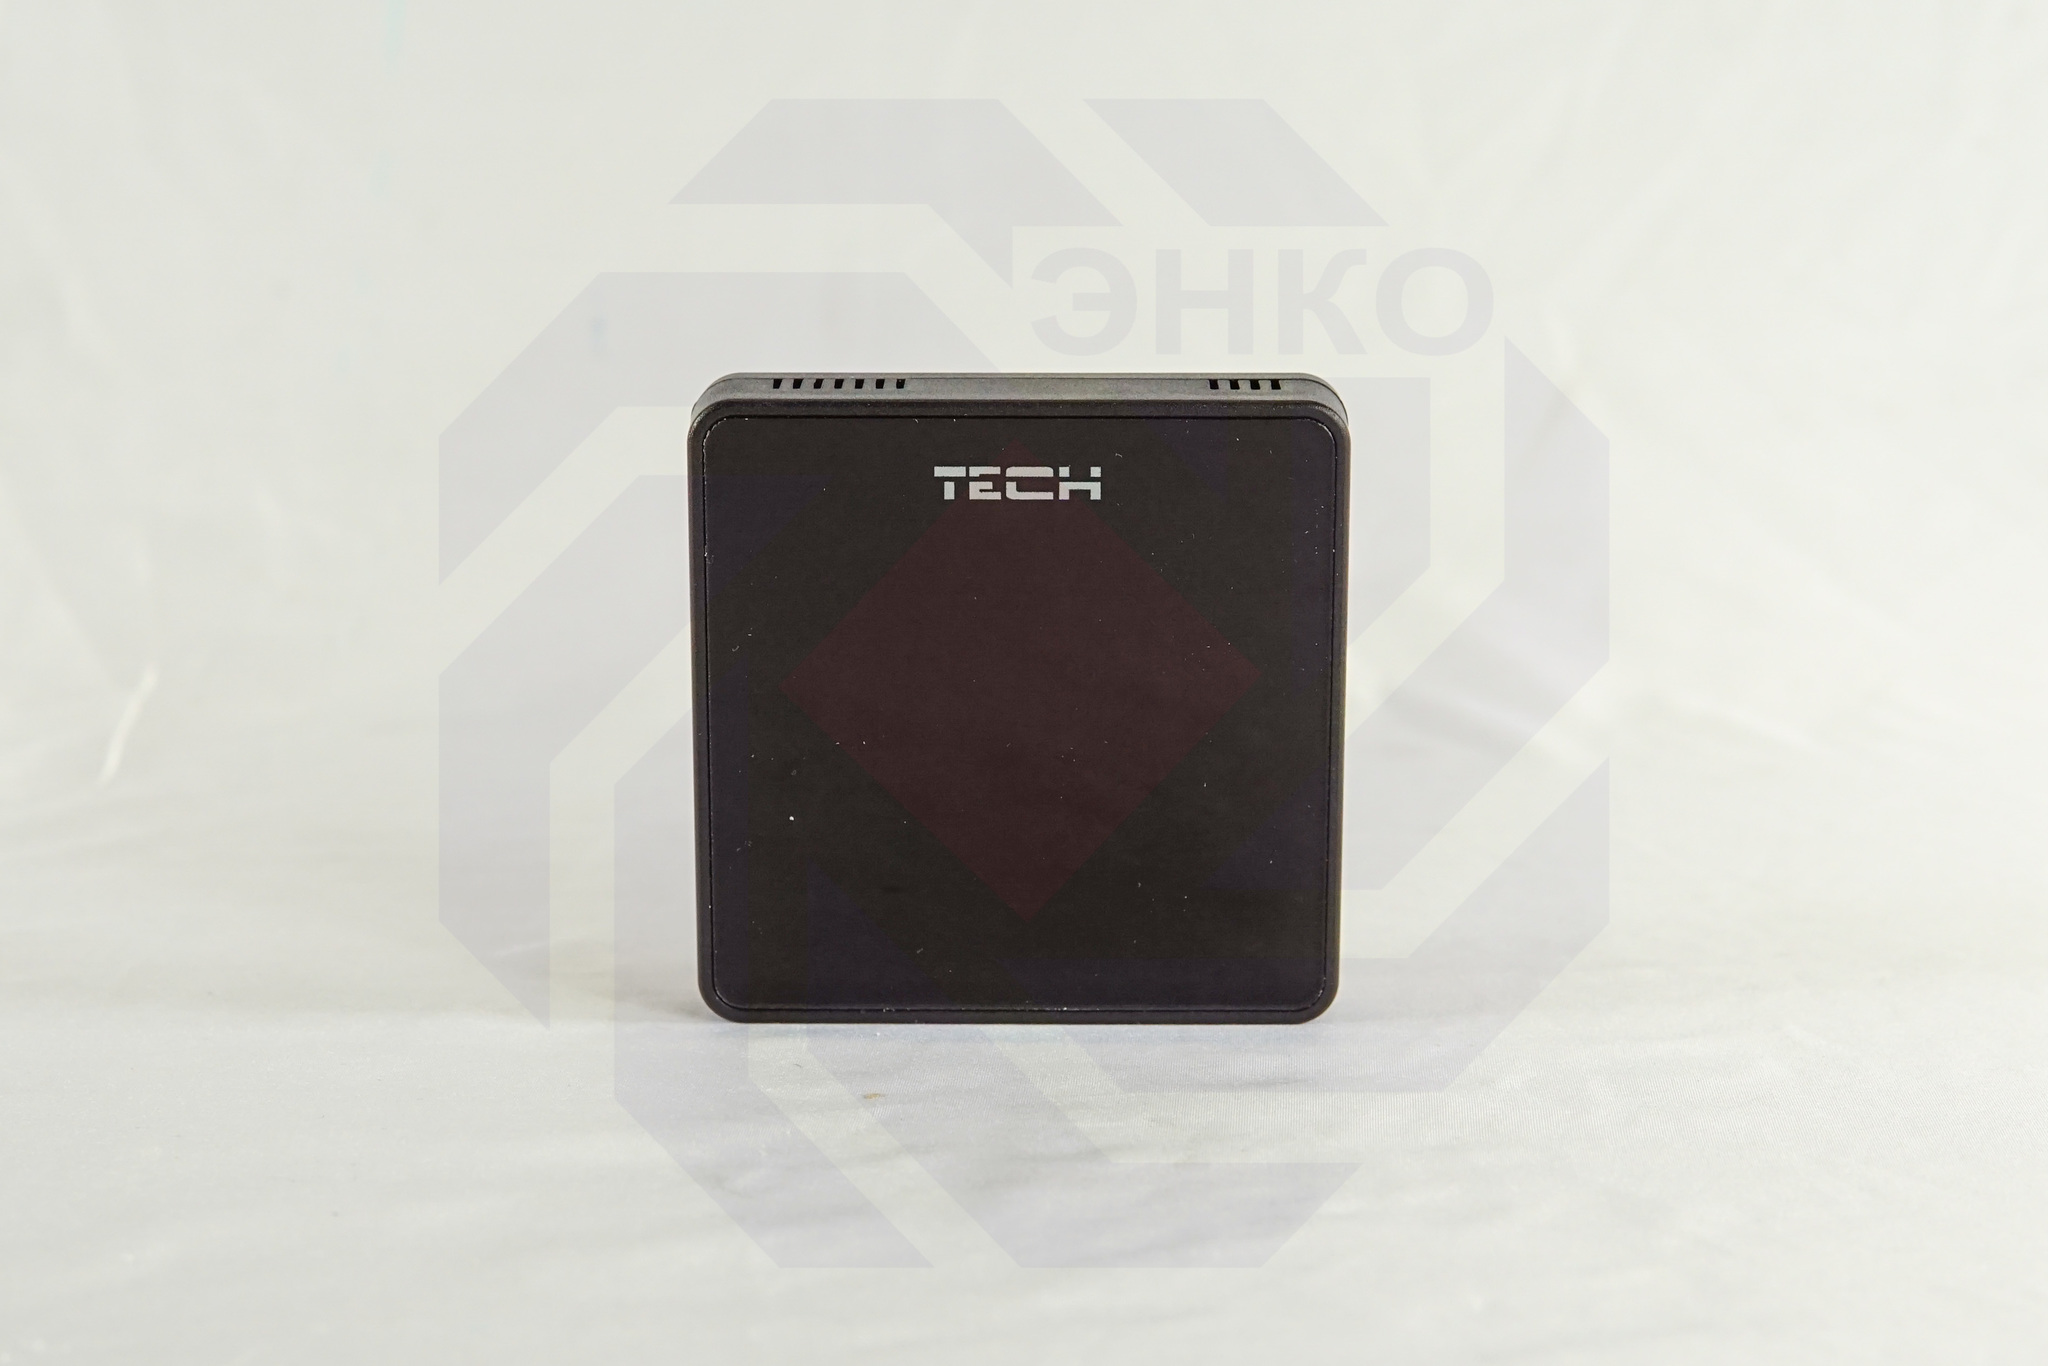 Датчик температуры комнатный TECH STEROWNIKI ST-C-8R черный